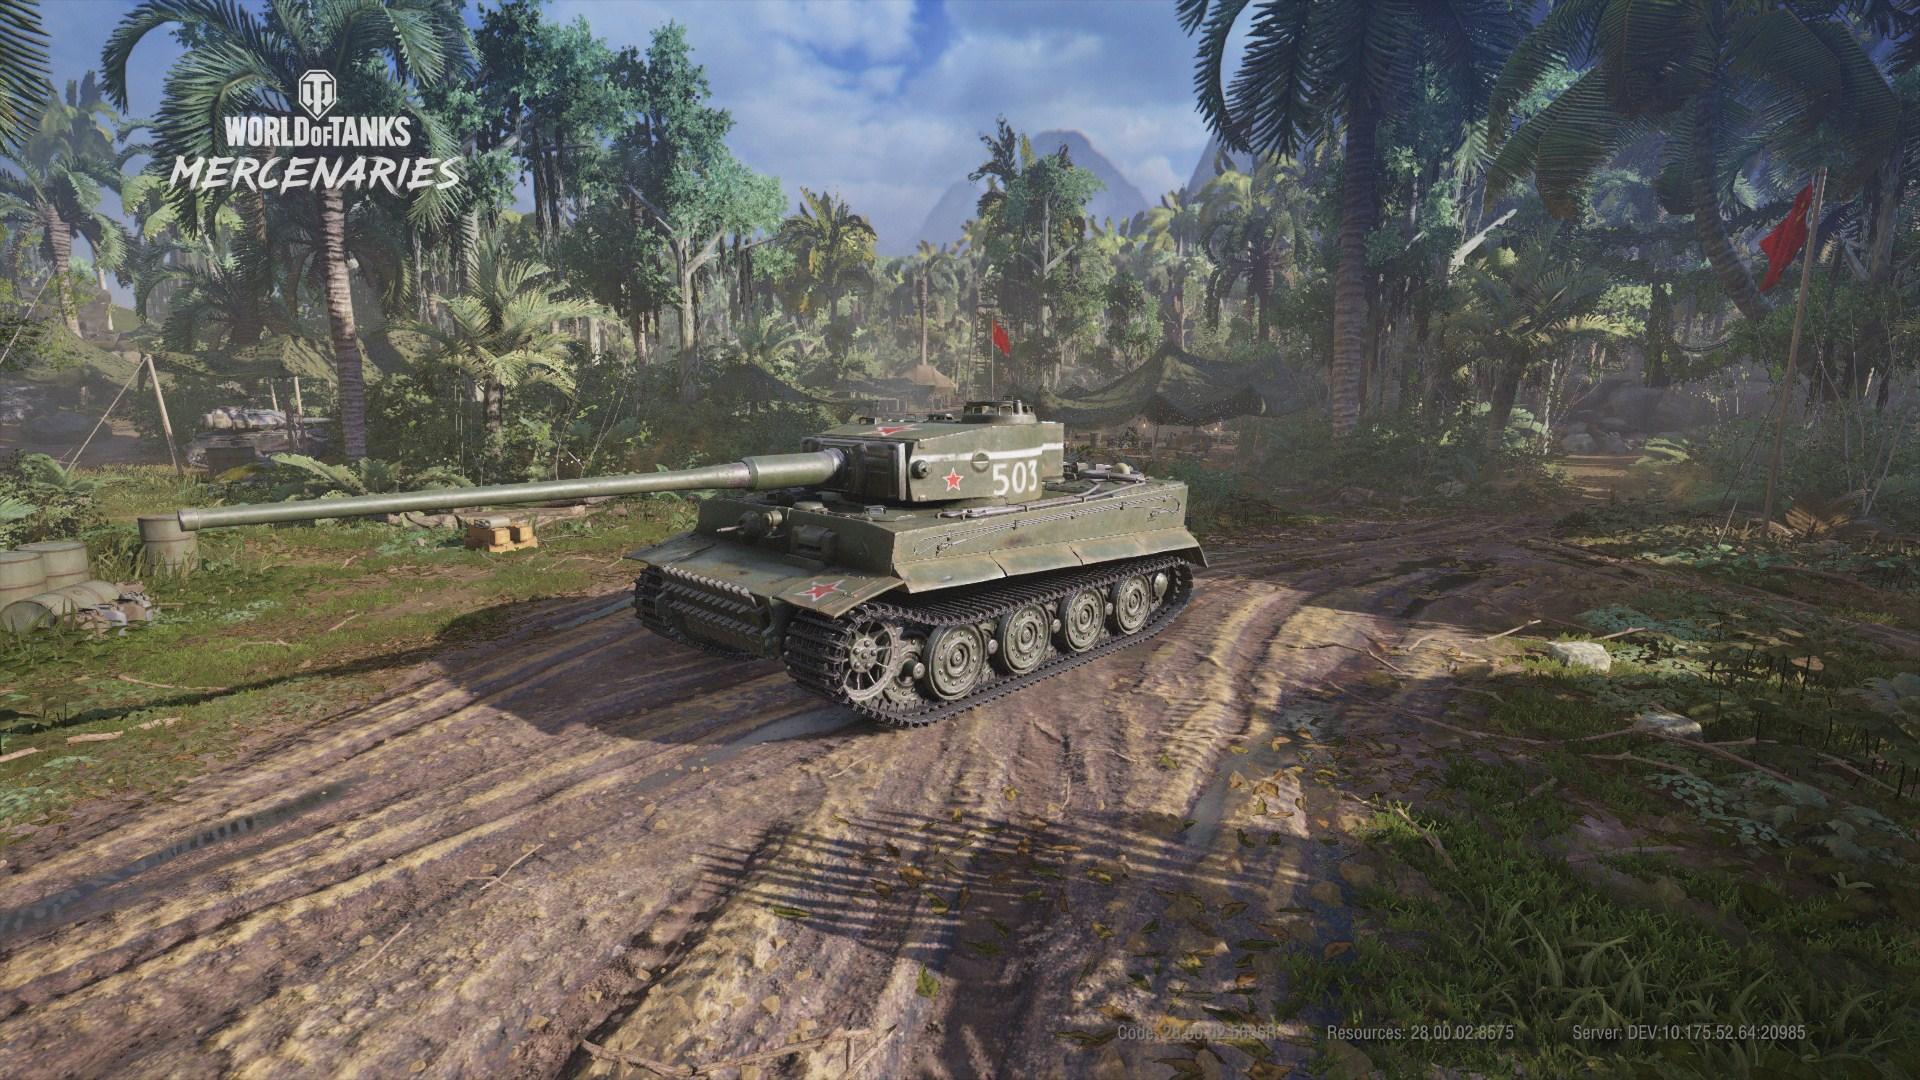 WoTMercenaries T-VI-100(Tier VII-Heavy) Screenshot1